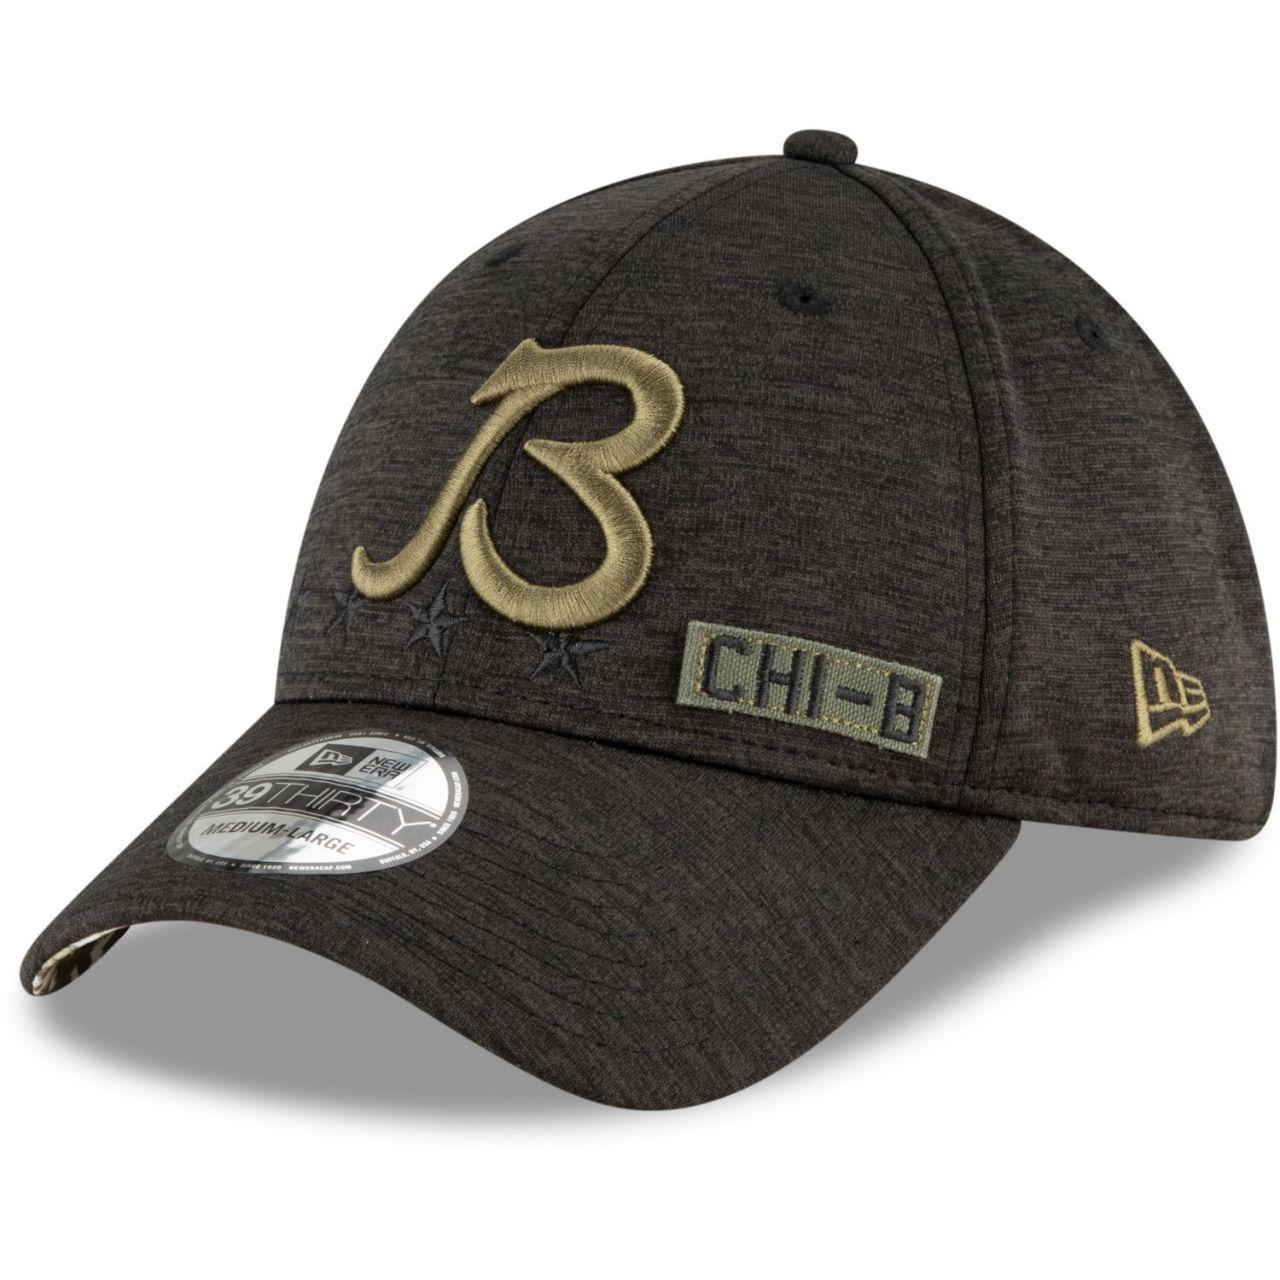 amfoo - New Era 39Thirty Cap Salute to Service Chicago Bears B